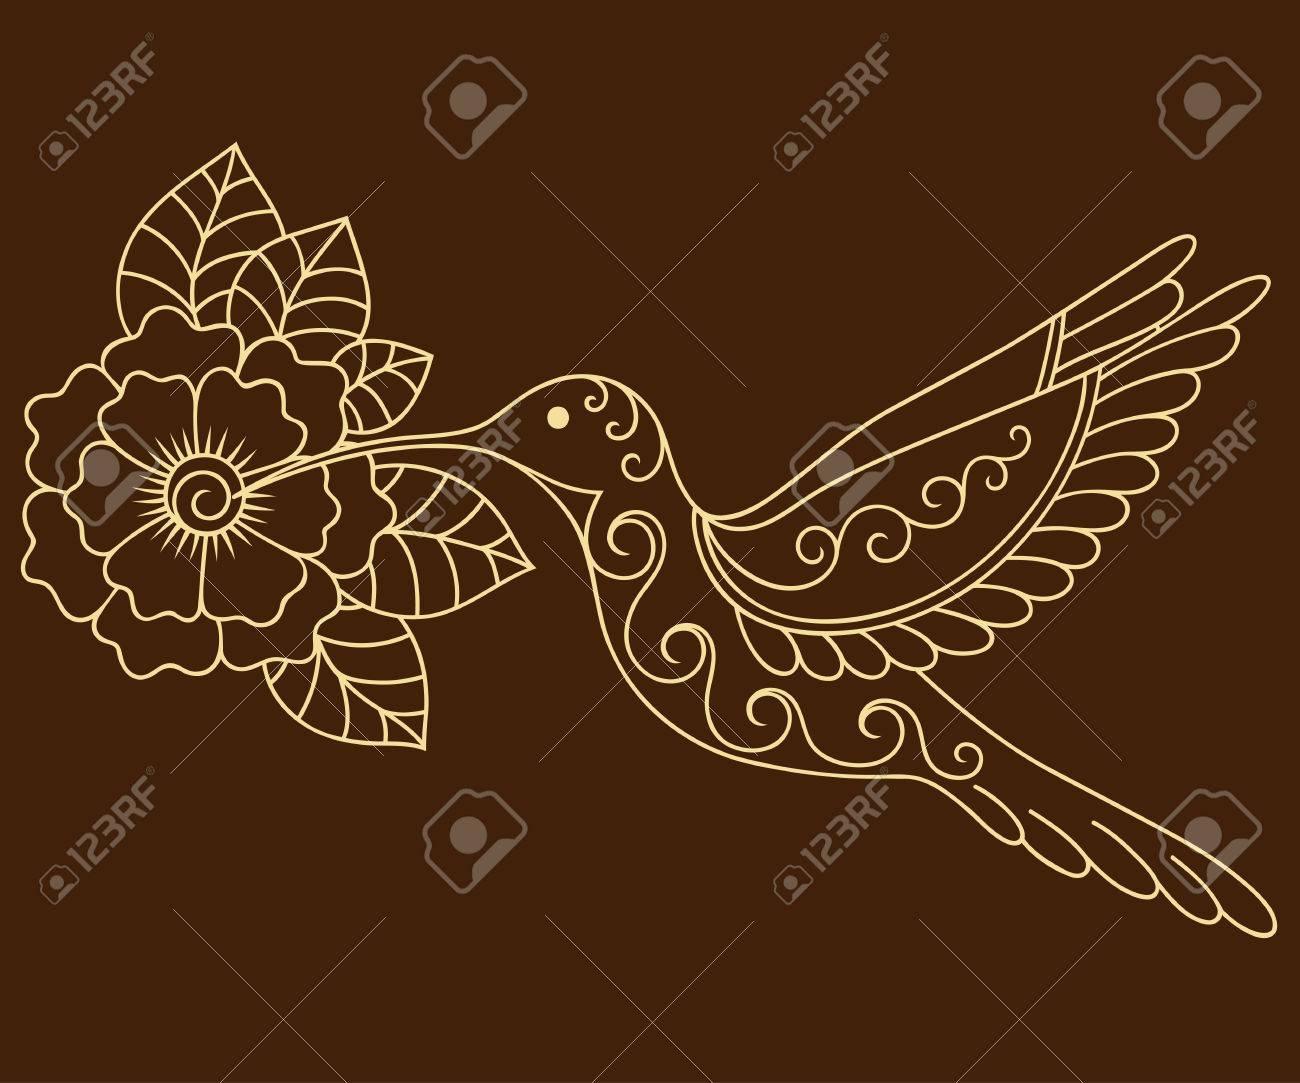 Henna Mehndi Vector : Henna tattoo flower and colibri template. mehndi style. set of